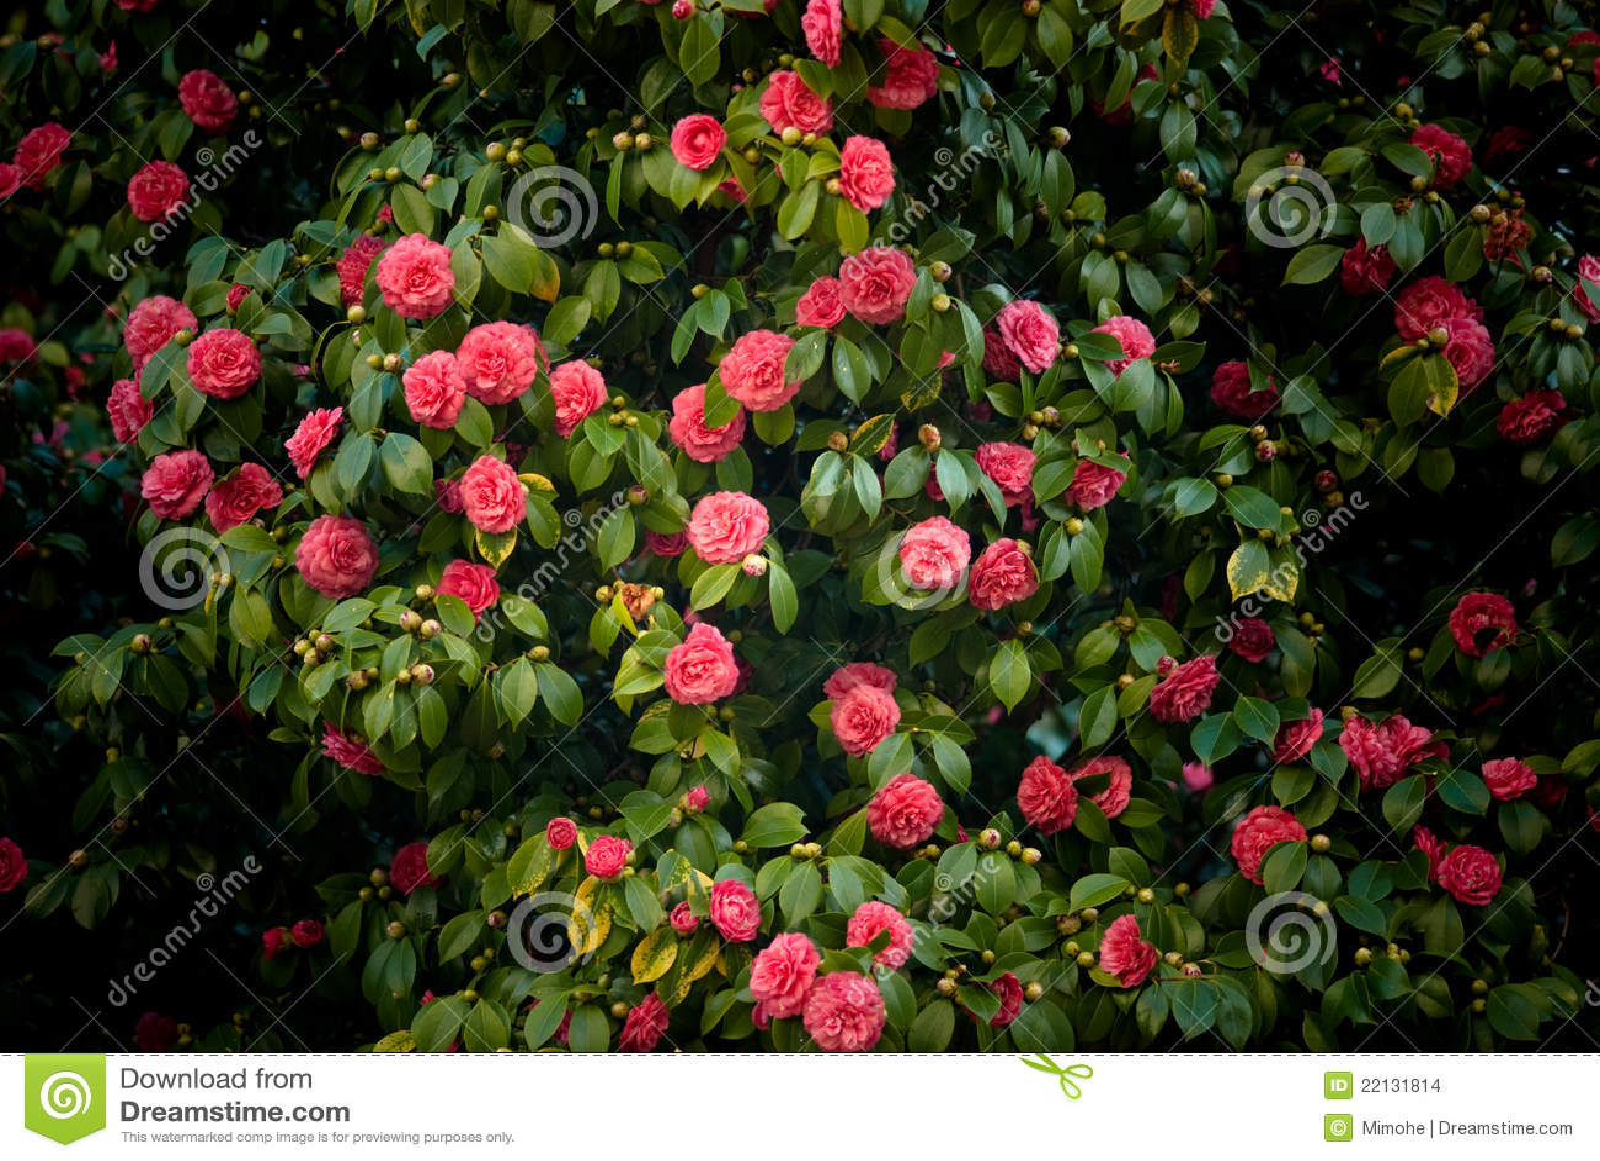 Camellia tree stock images image 22131814 - Camelia fotos ...